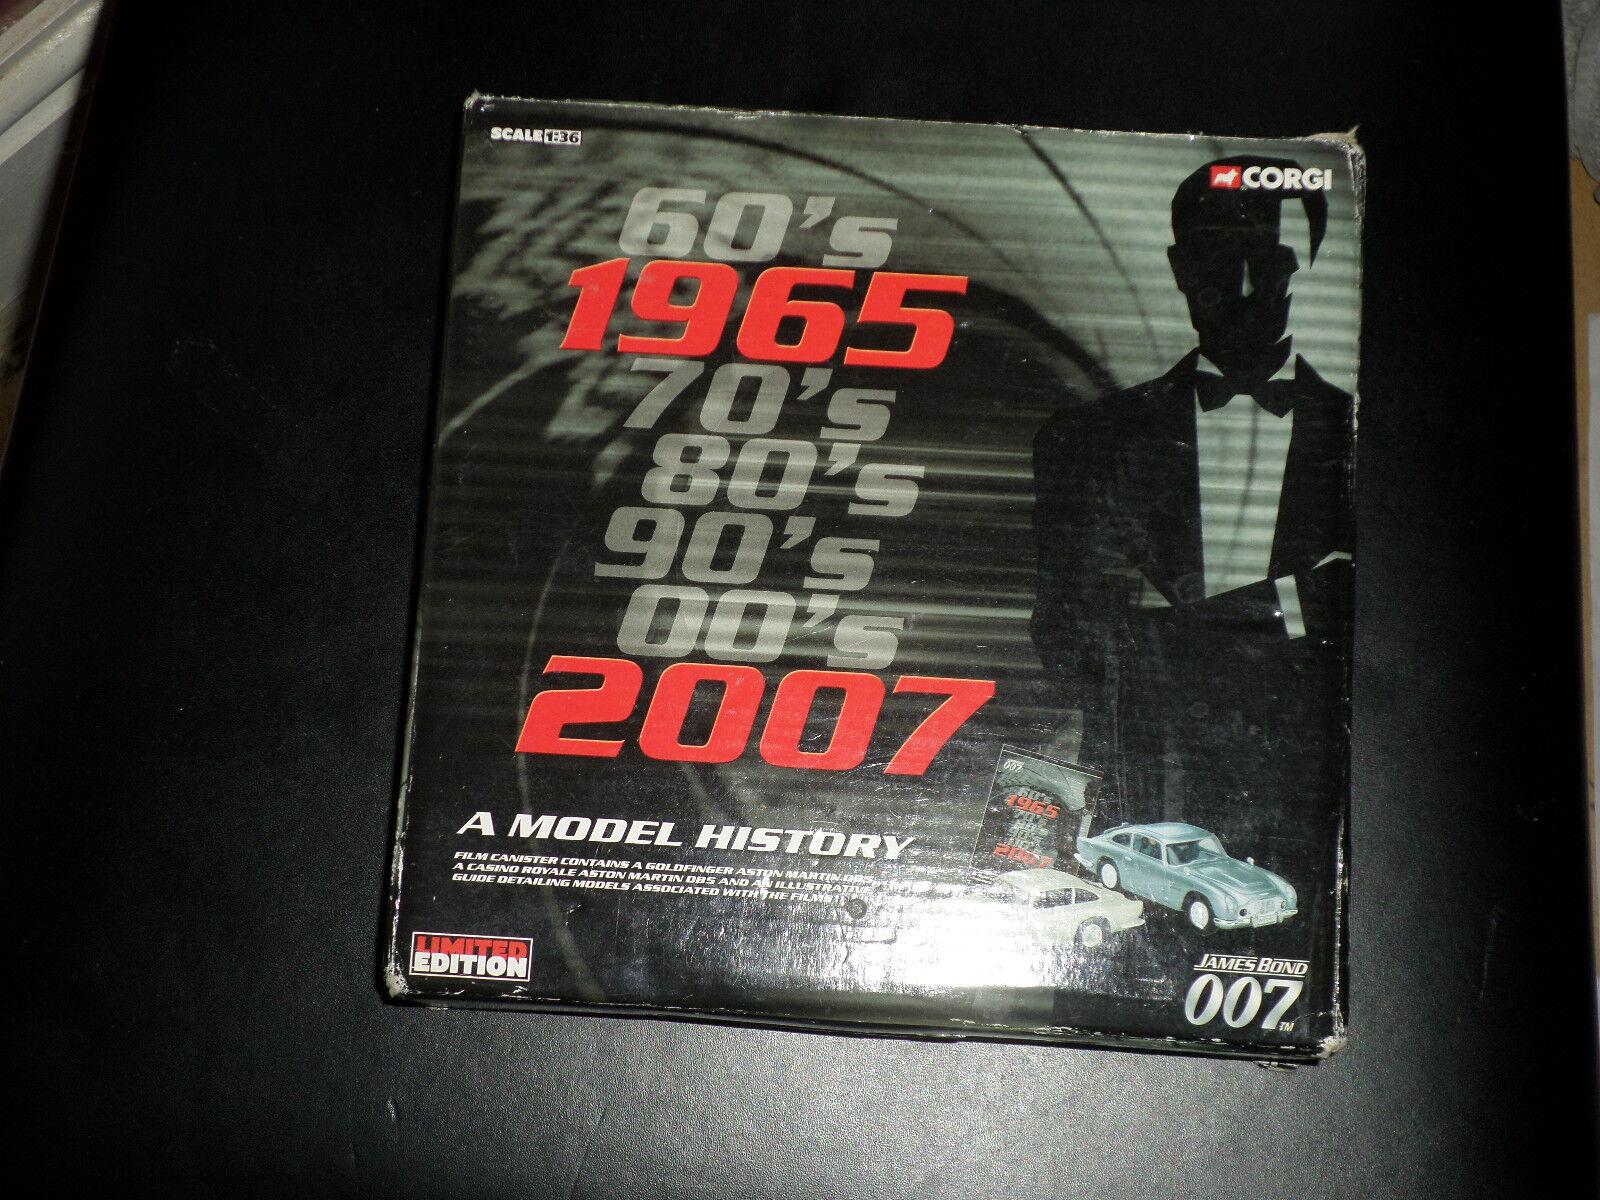 James Bond Aston Martin DB5 2-piece set_Brand New_Bargain